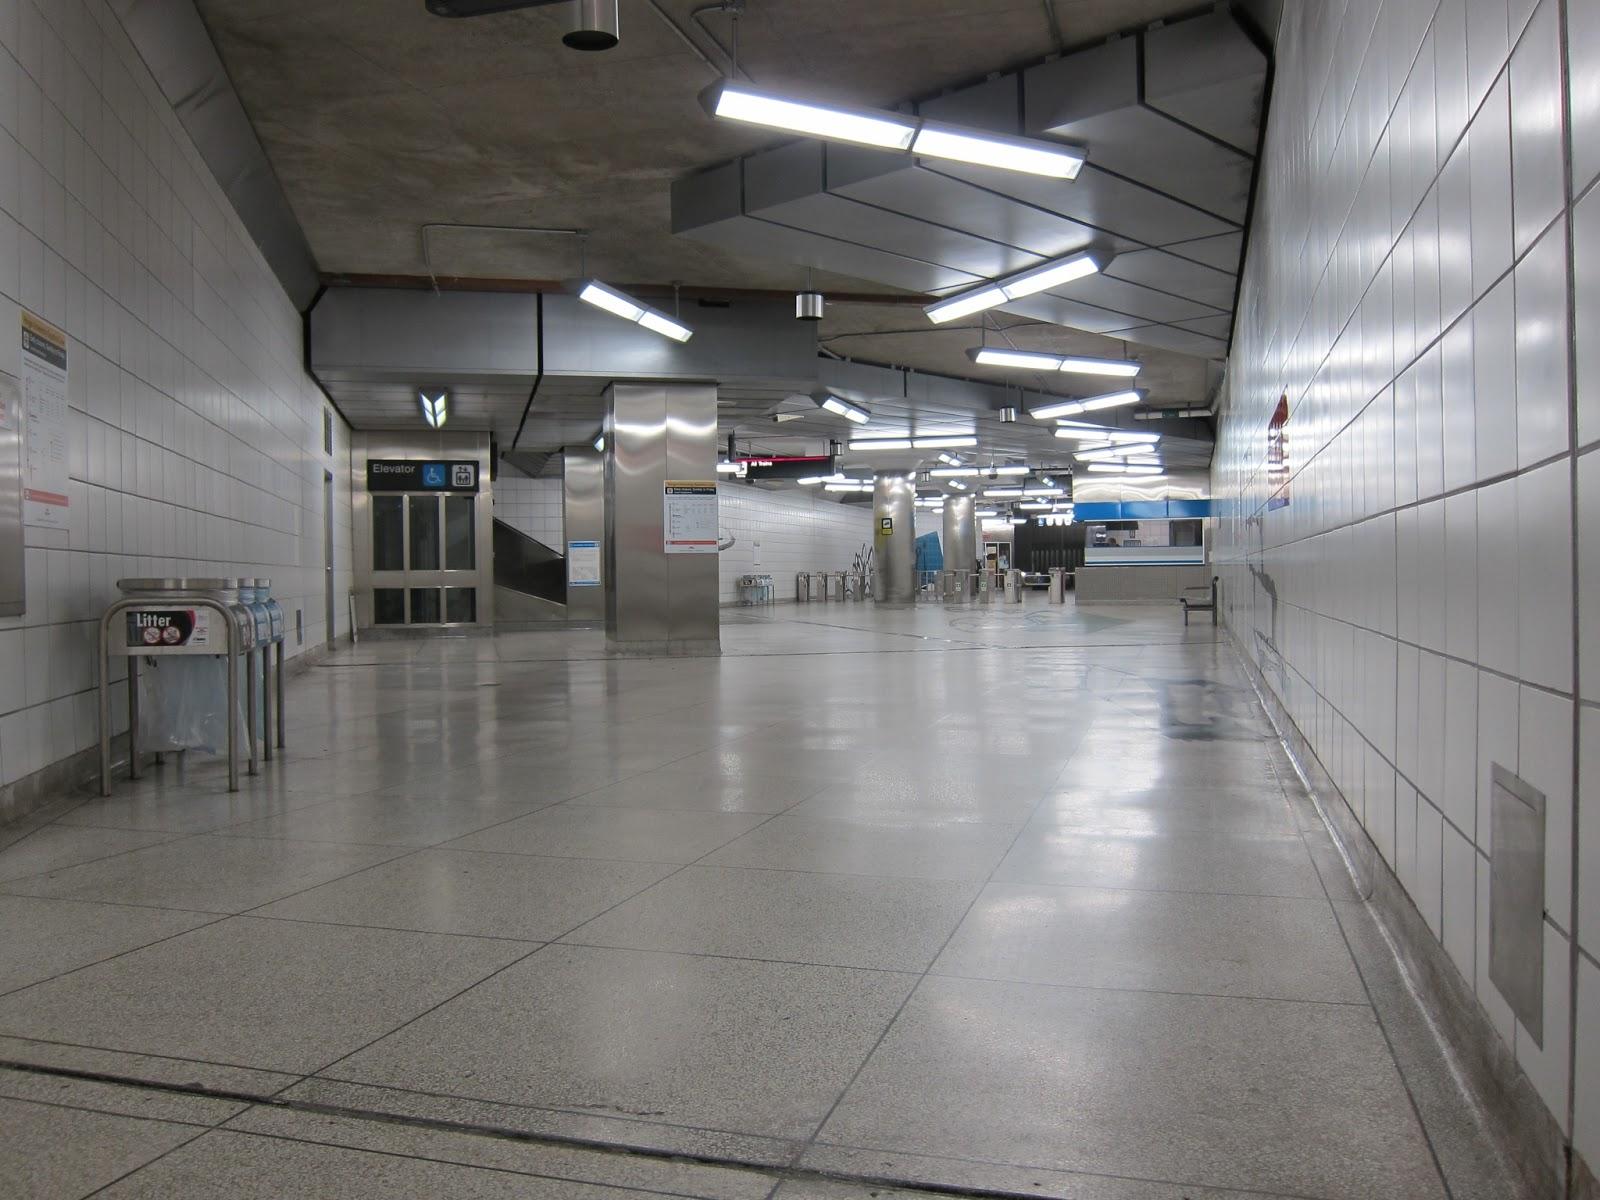 Photo: mezzanine level at Bayview station